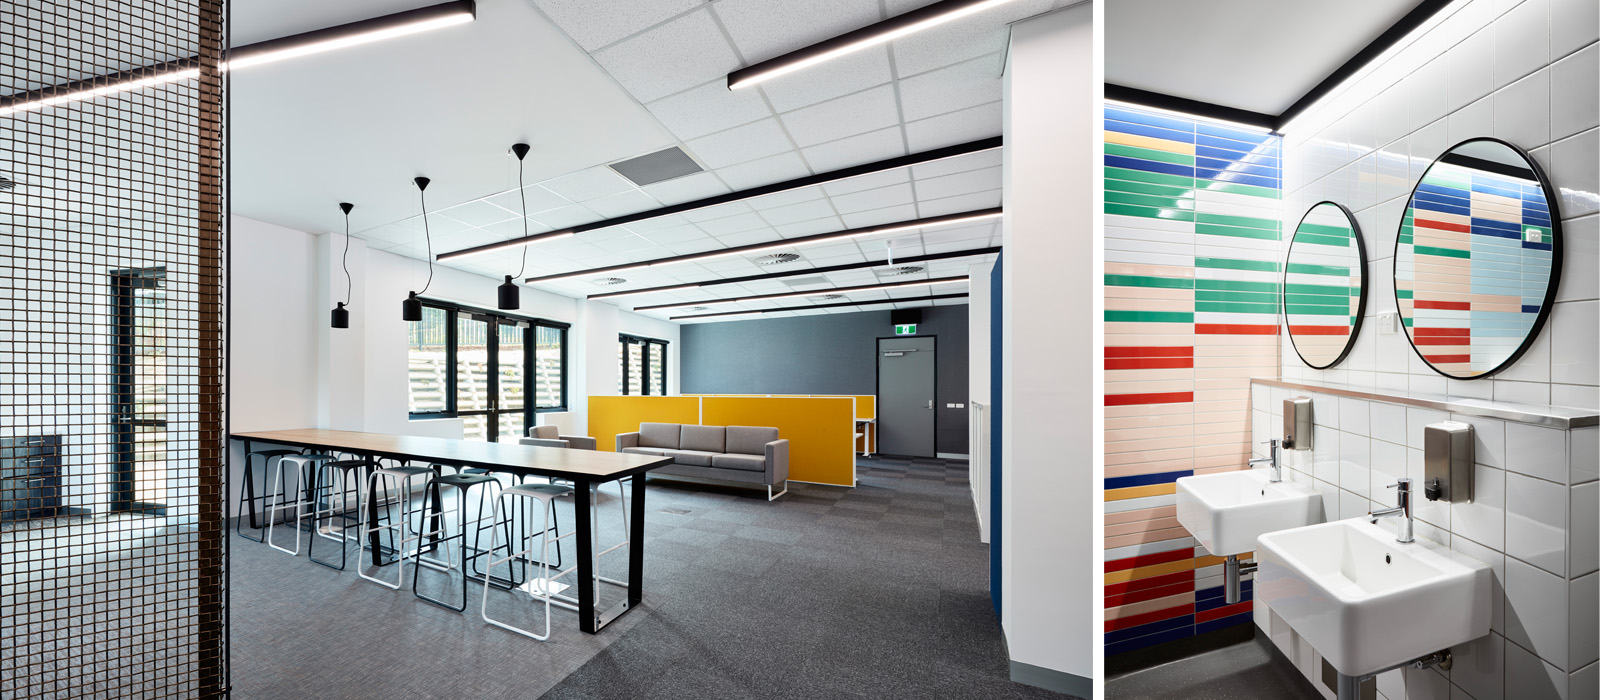 H2o-Architects-Melbourne-Australia-Belgrave-Community-Hub-08